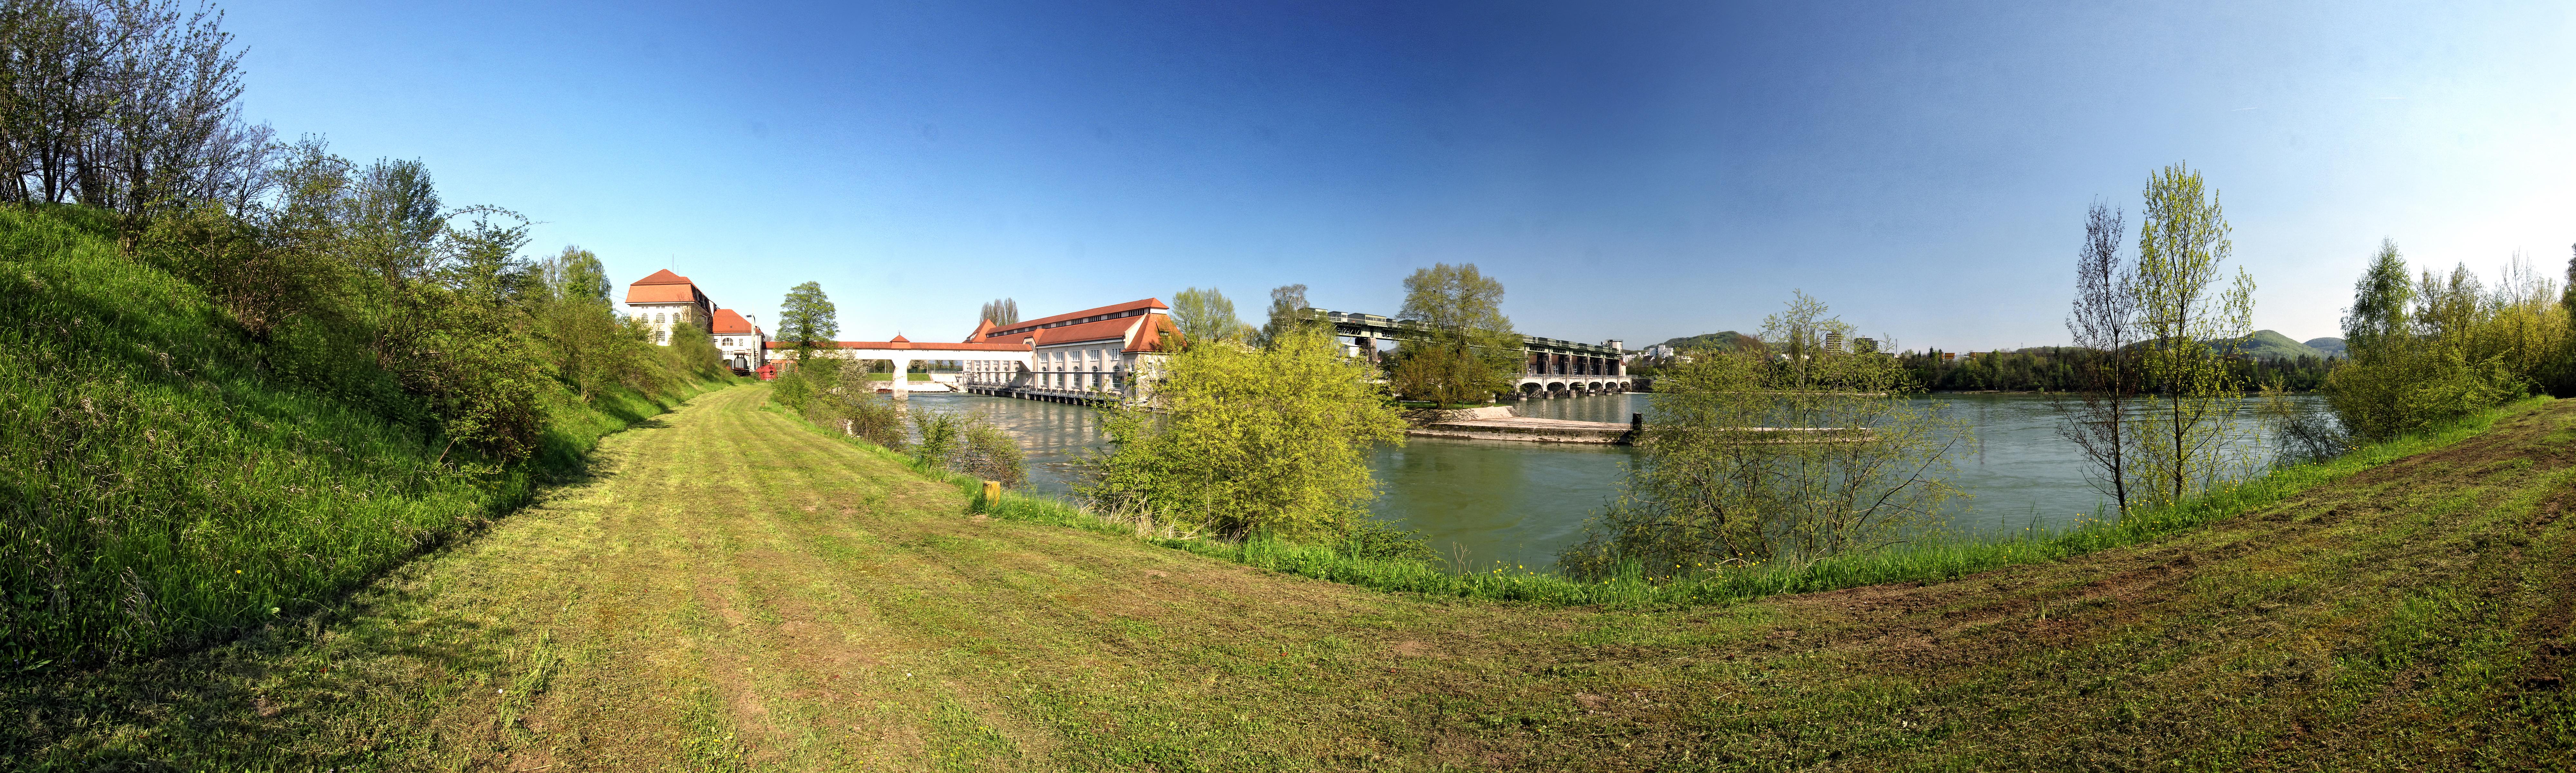 hydroelectric powerstation Wyhlen